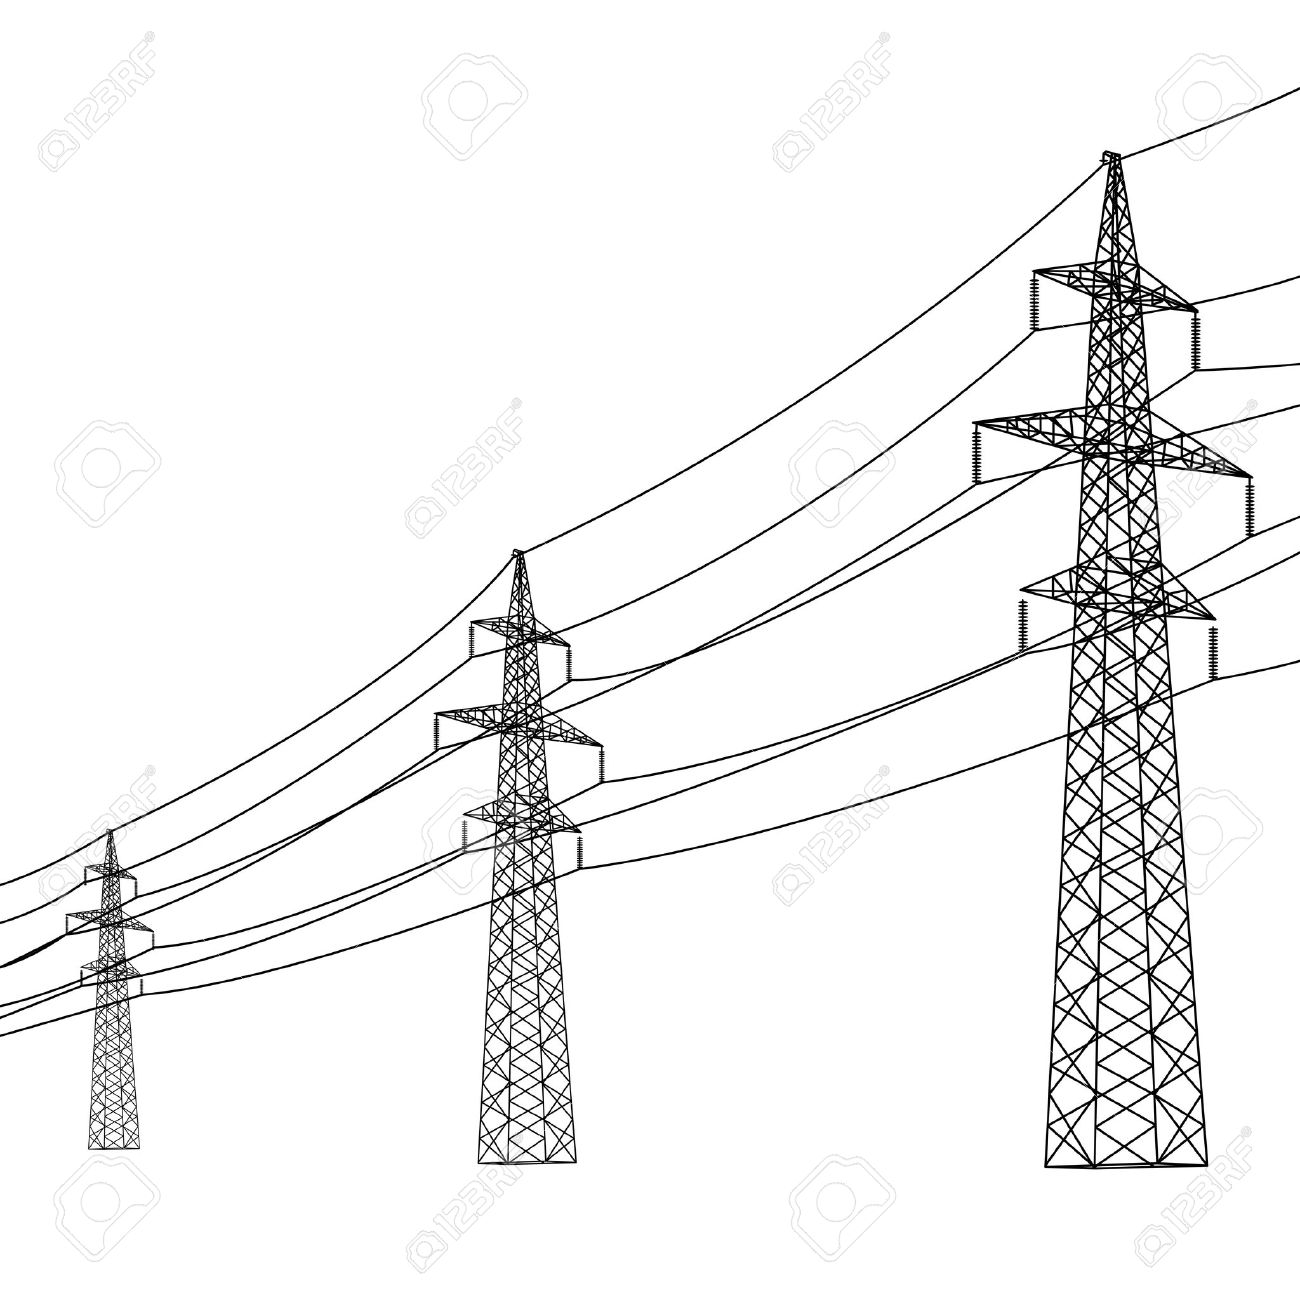 telephone pole wires diagram